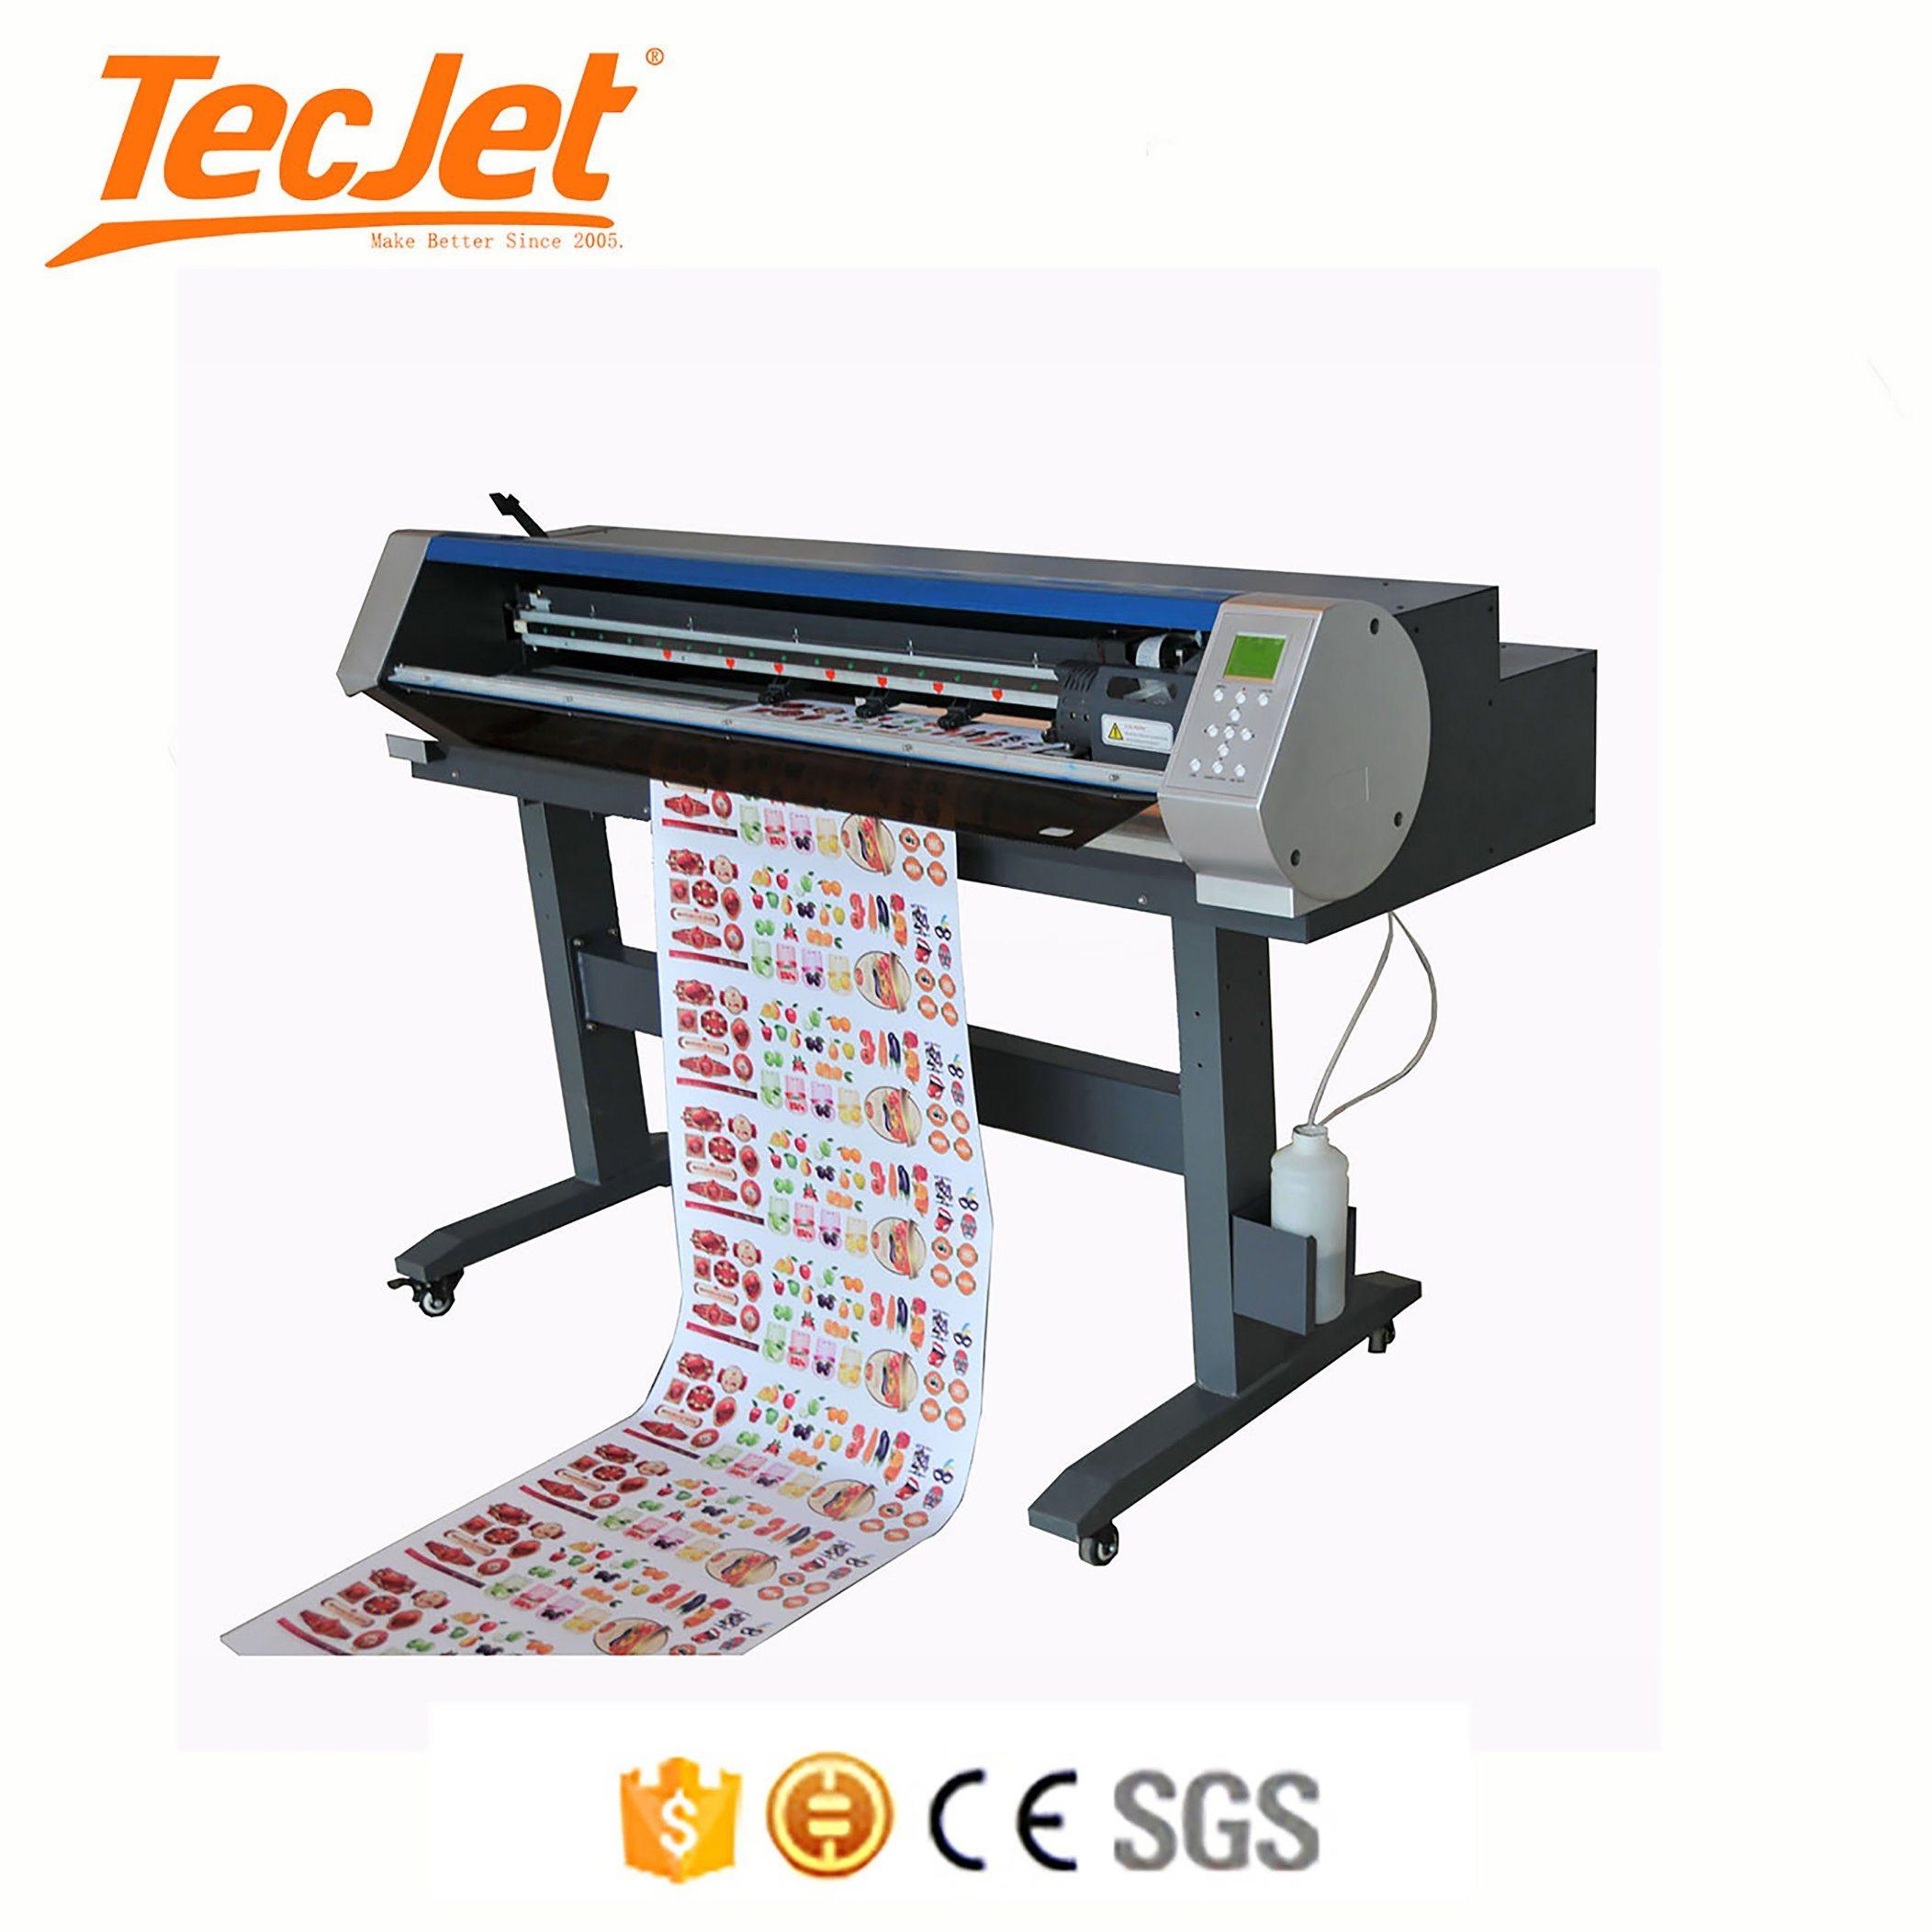 hot item tecjet promotional items media poster printer cutter price